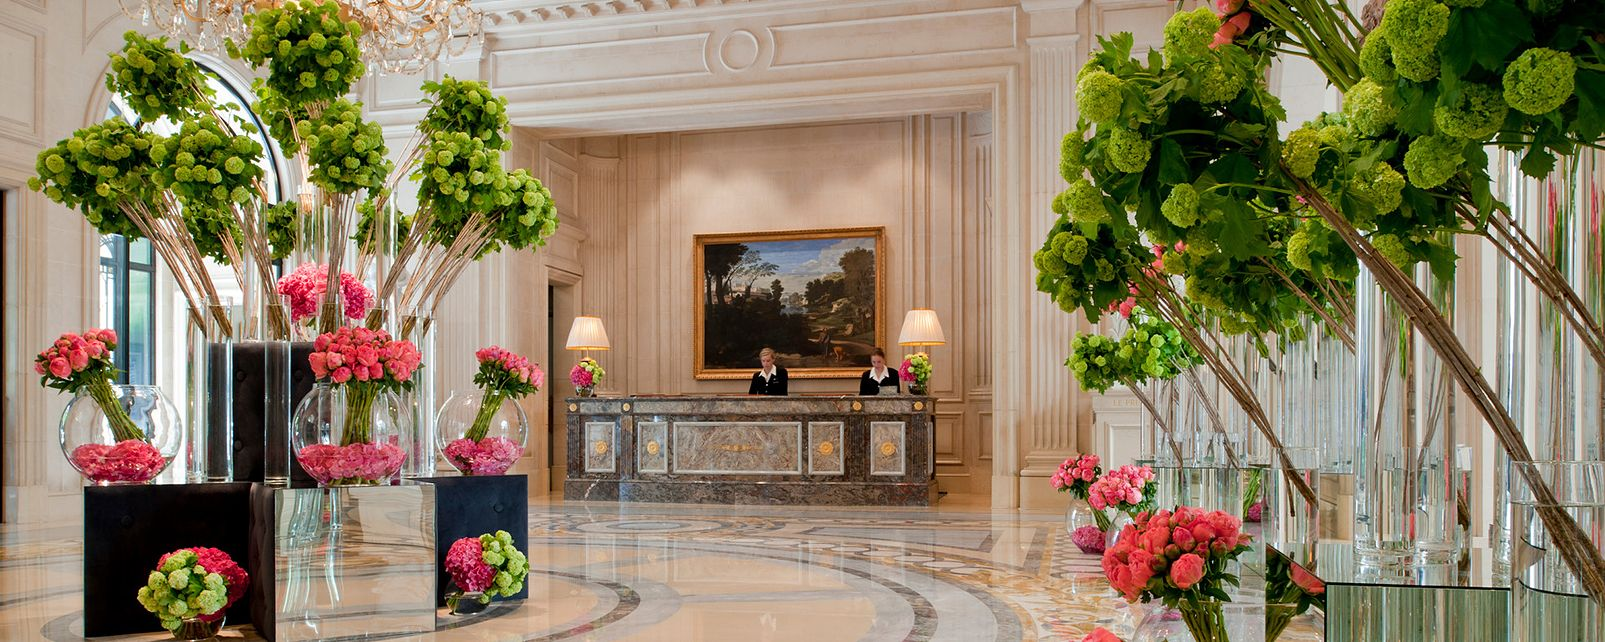 Hotel  Four Seasons George V